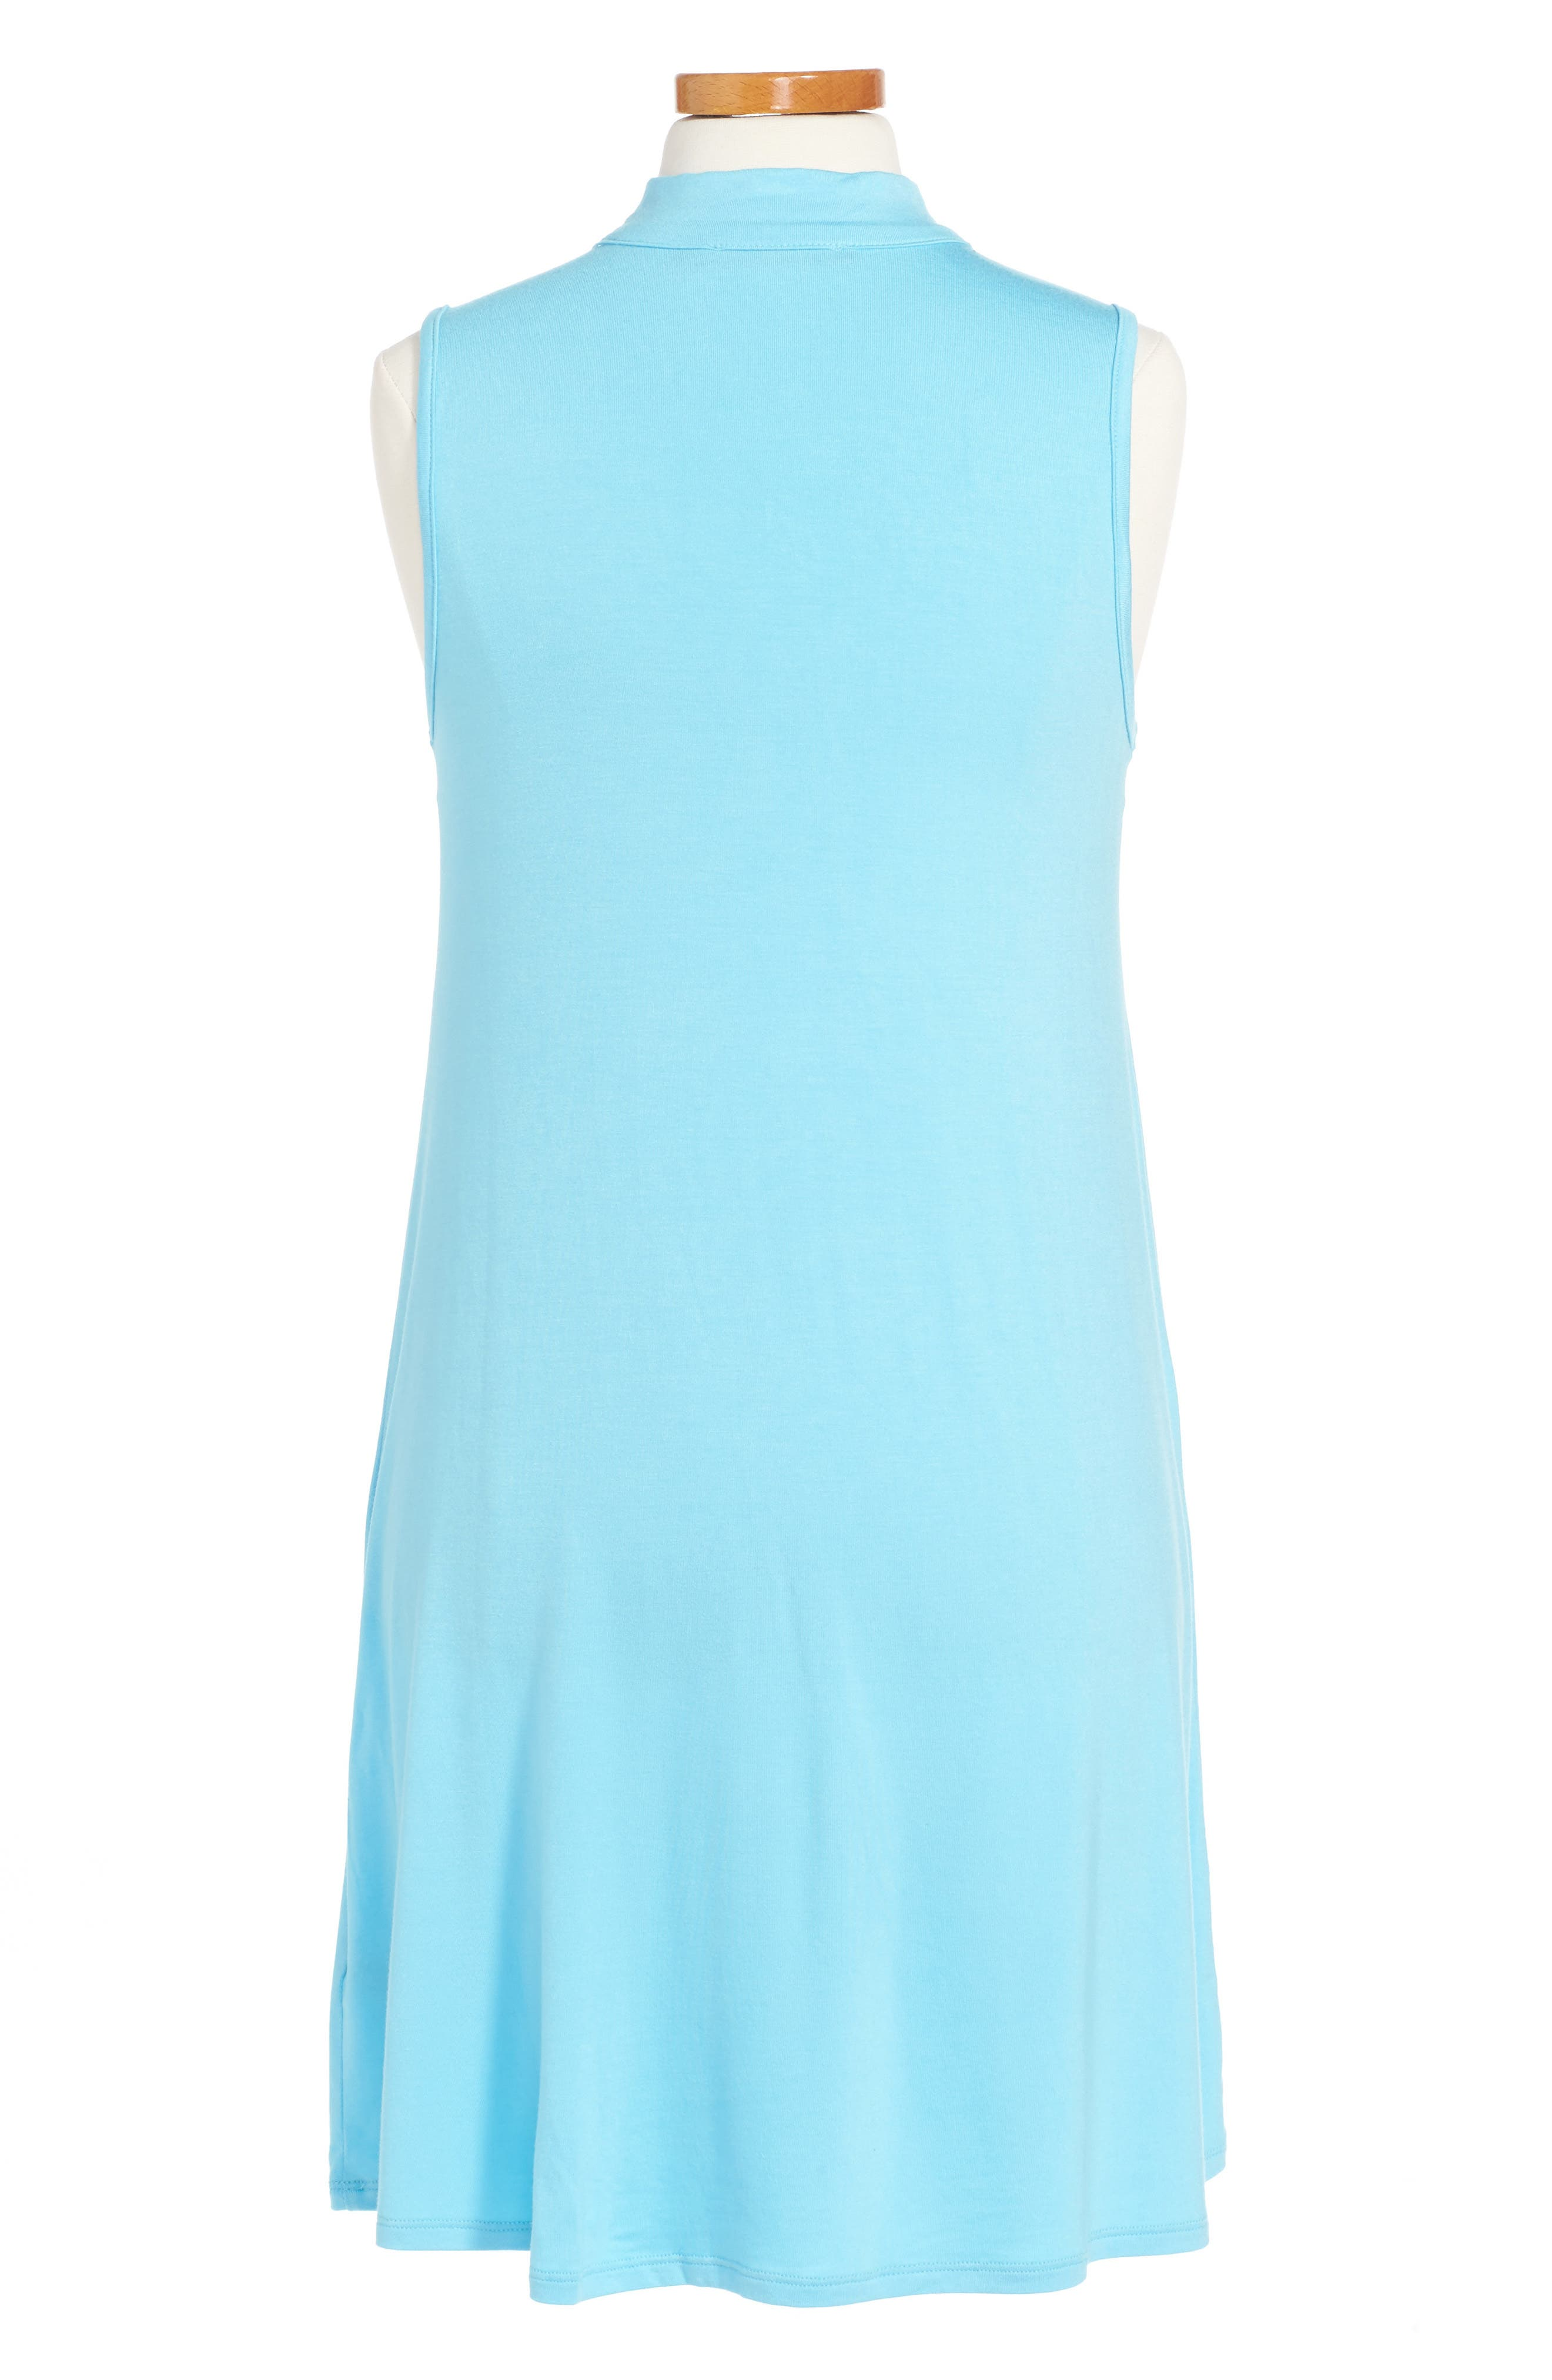 Anna Gigi Neck Dress,                             Main thumbnail 2, color,